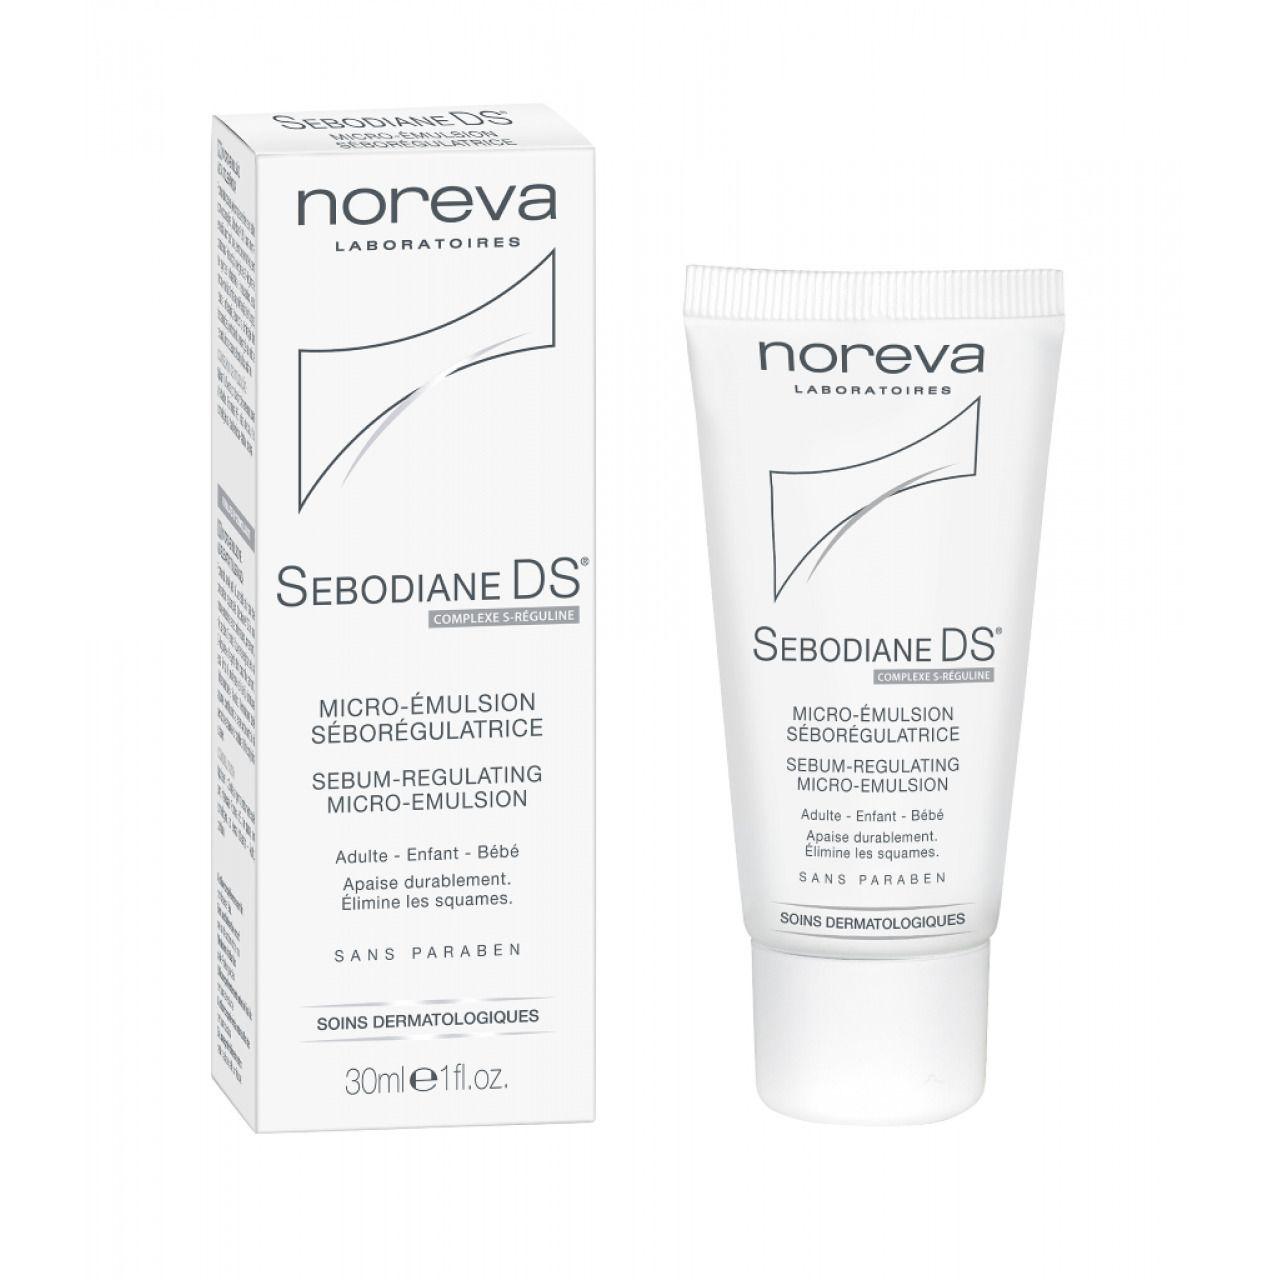 Noreva Sebodiane DS Микроэмульсия, эмульсия для лица, 30 мл, 1 шт.